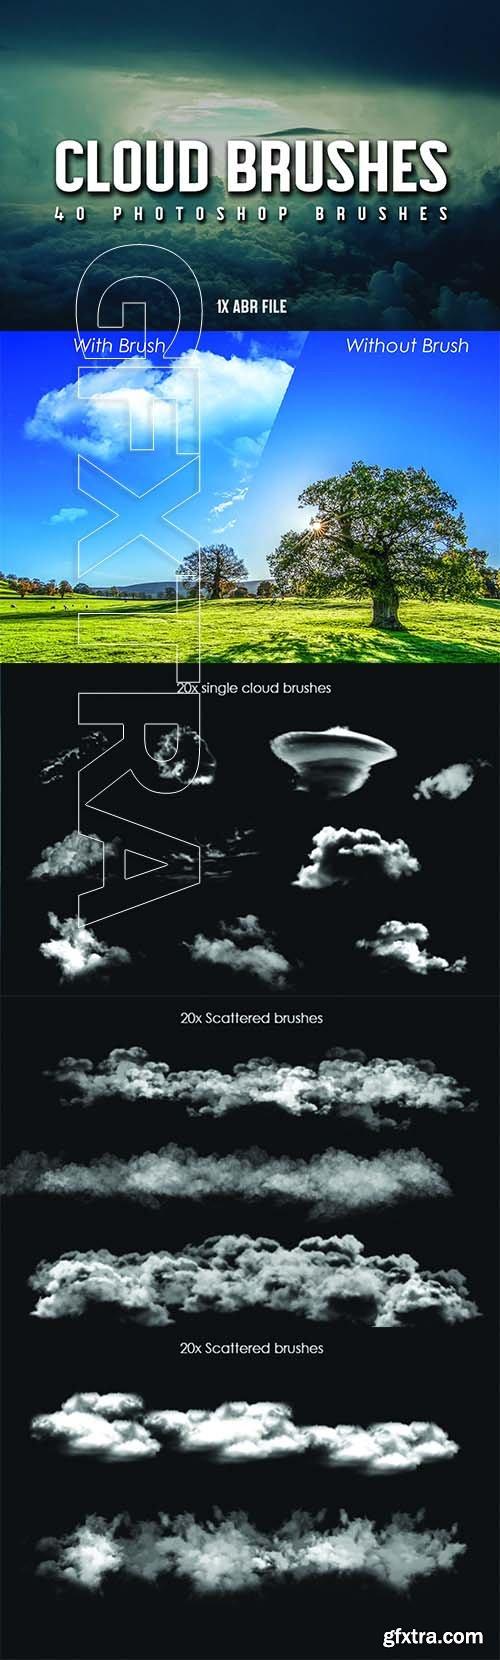 CreativeMarket - 40 Cloud Brushes for Photoshop 3799716